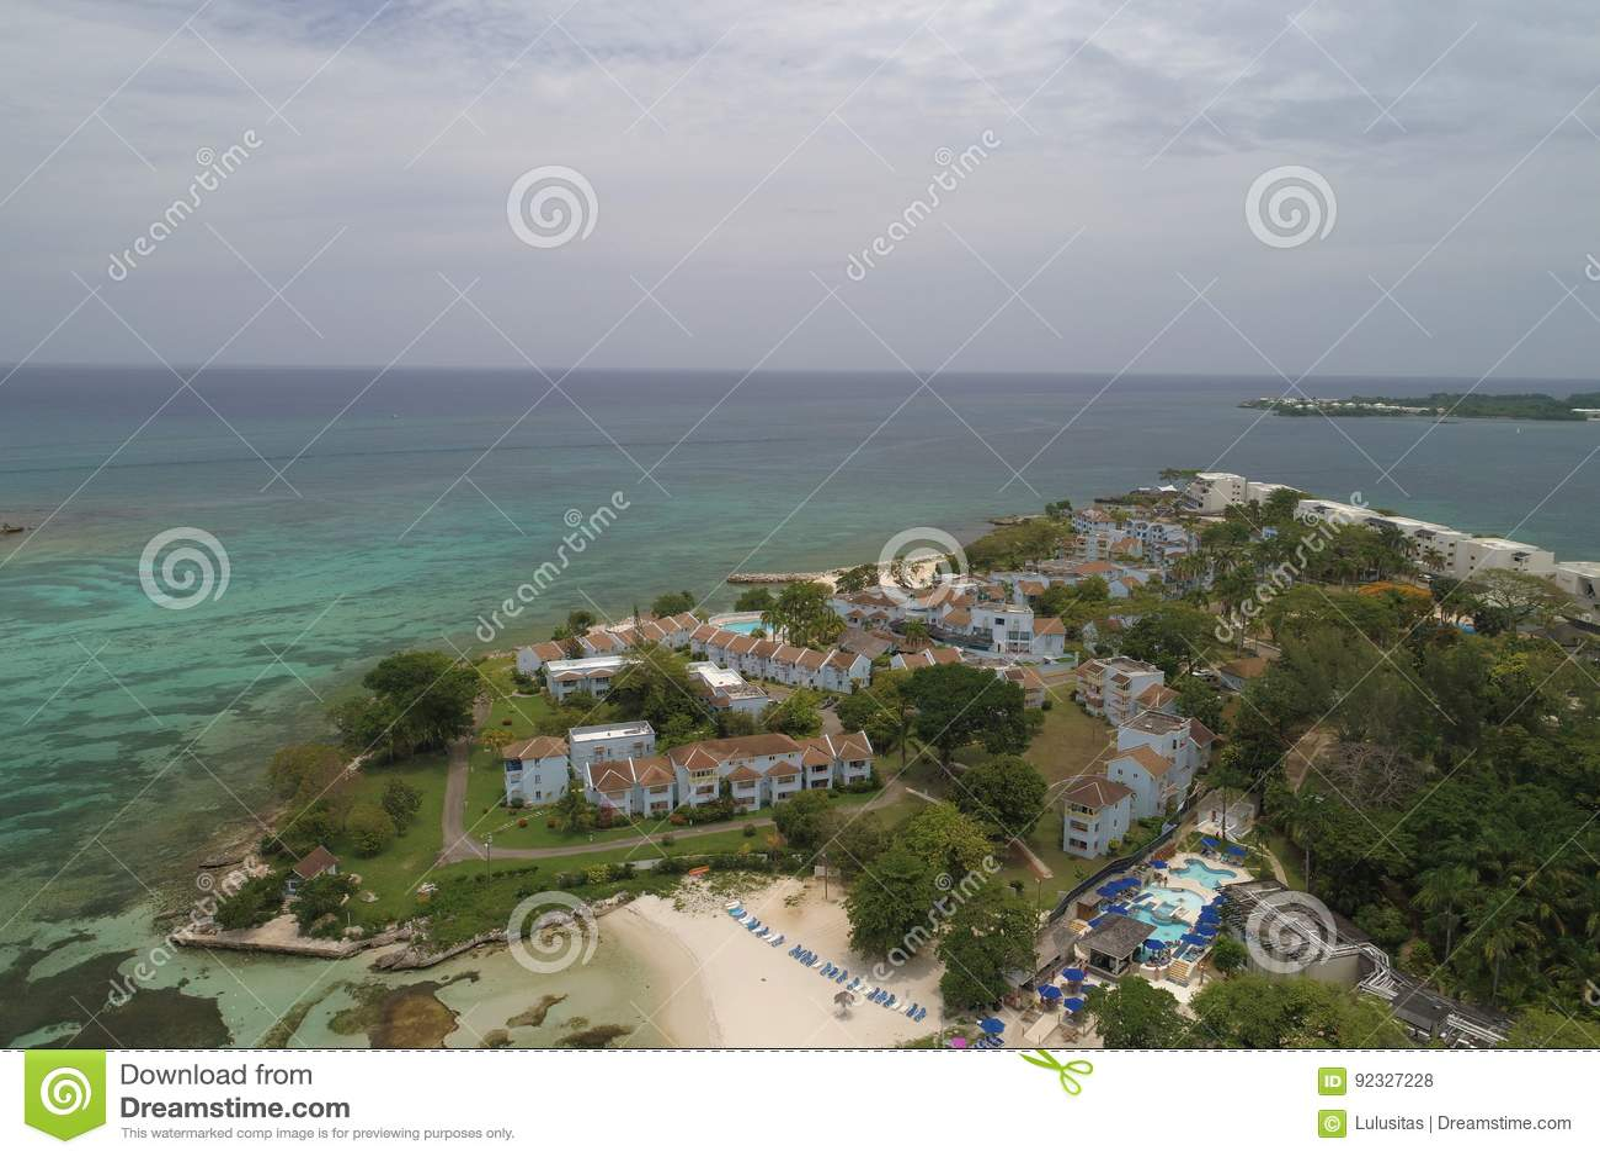 Point Village Resort Negril Jamaica Stock Photo Image Of